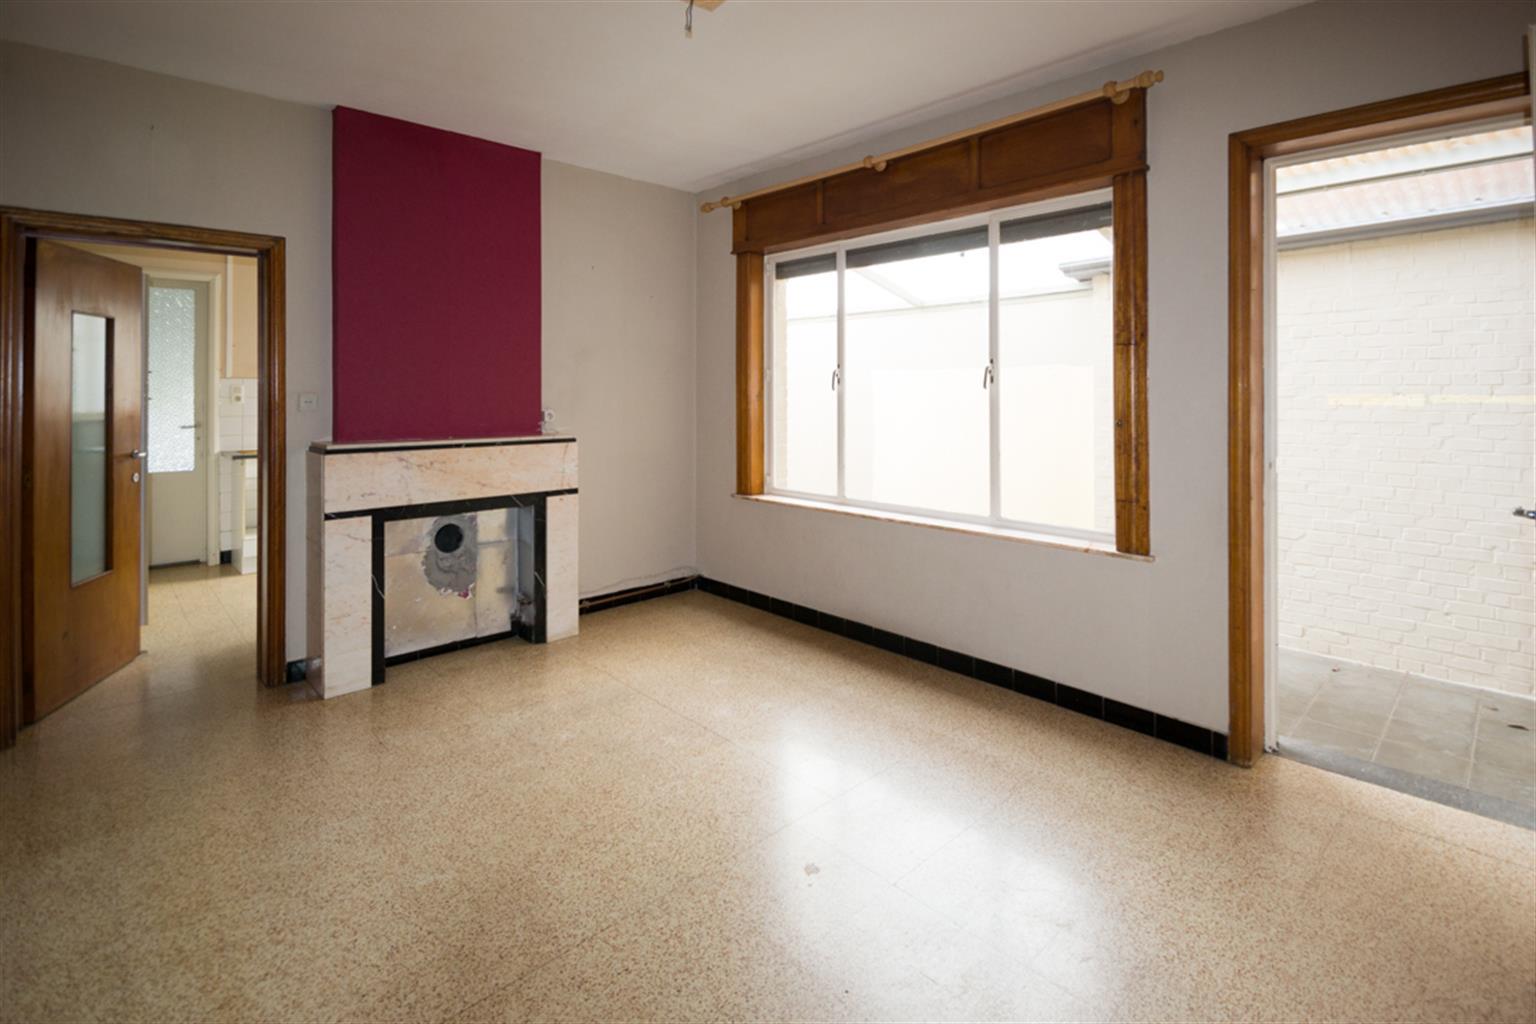 Maison - Houdeng-Aimeries - #4295574-4